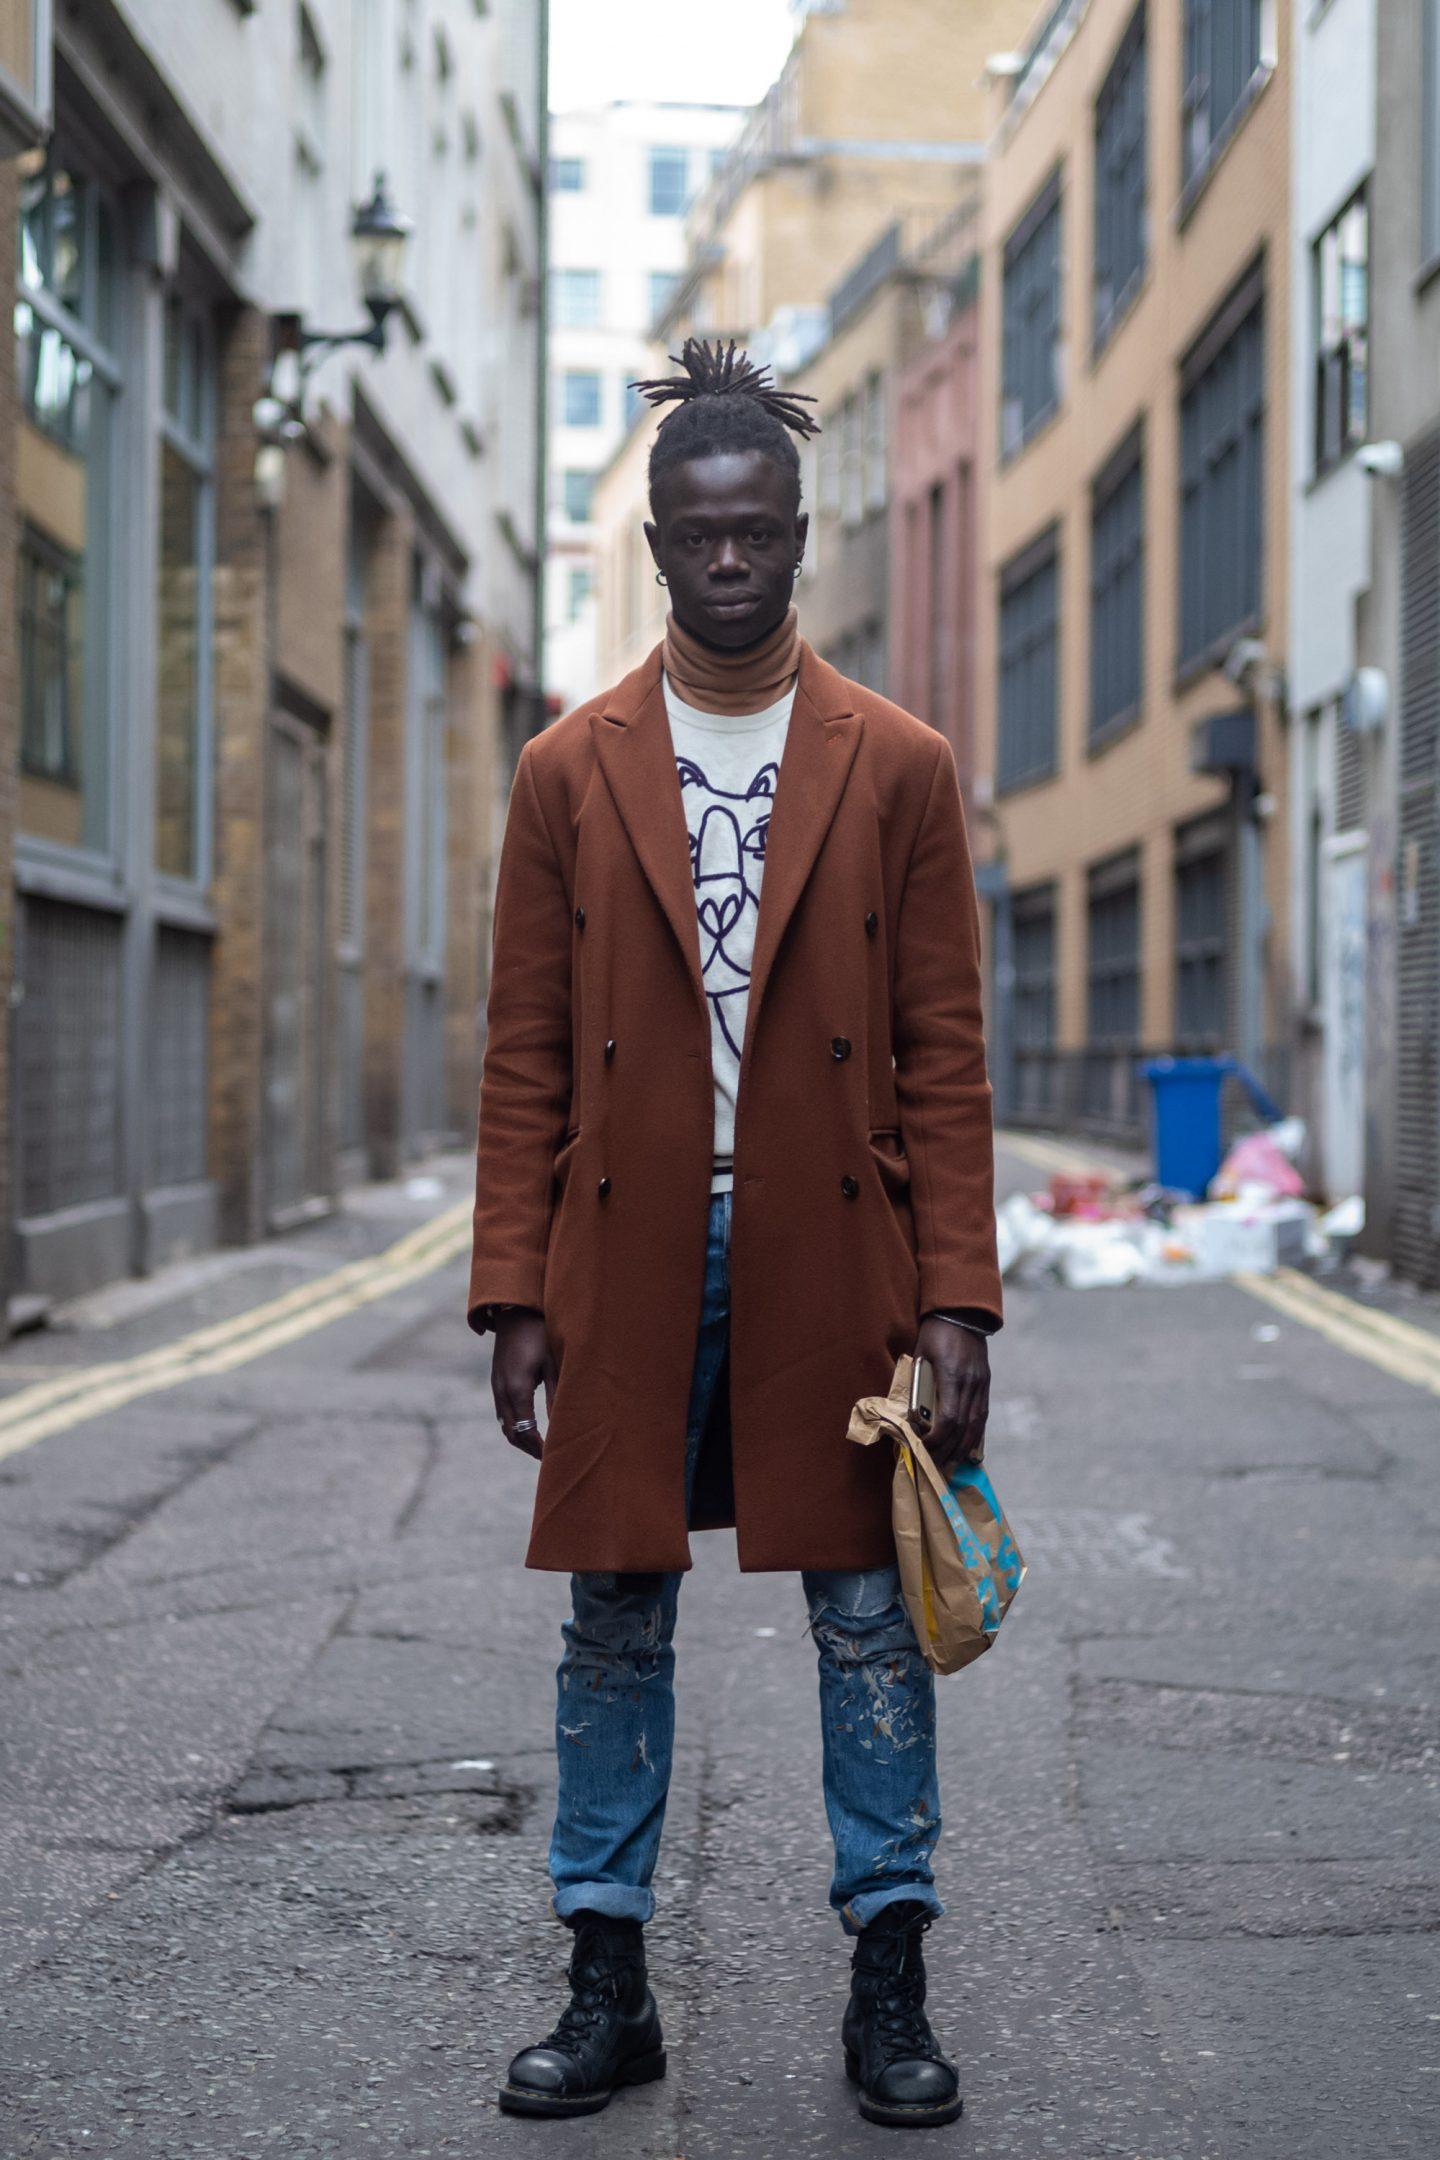 Serendipity: Portraits of Strangers in Soho